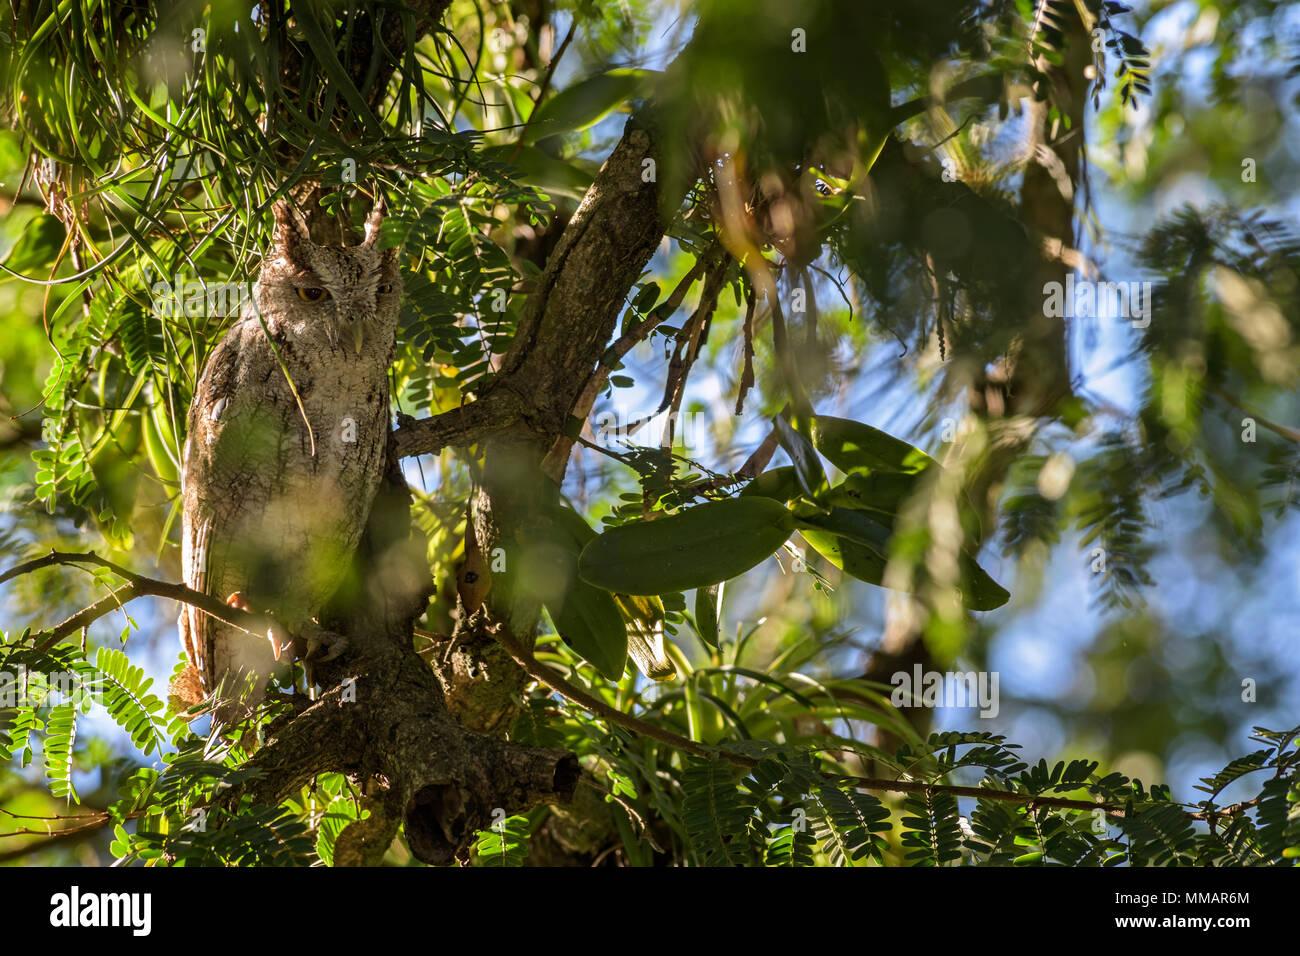 Pazifik - megascops Screech-Owl cooperi, schöne Eule aus Mittelamerika, Wälder, Costa Rica. Stockbild